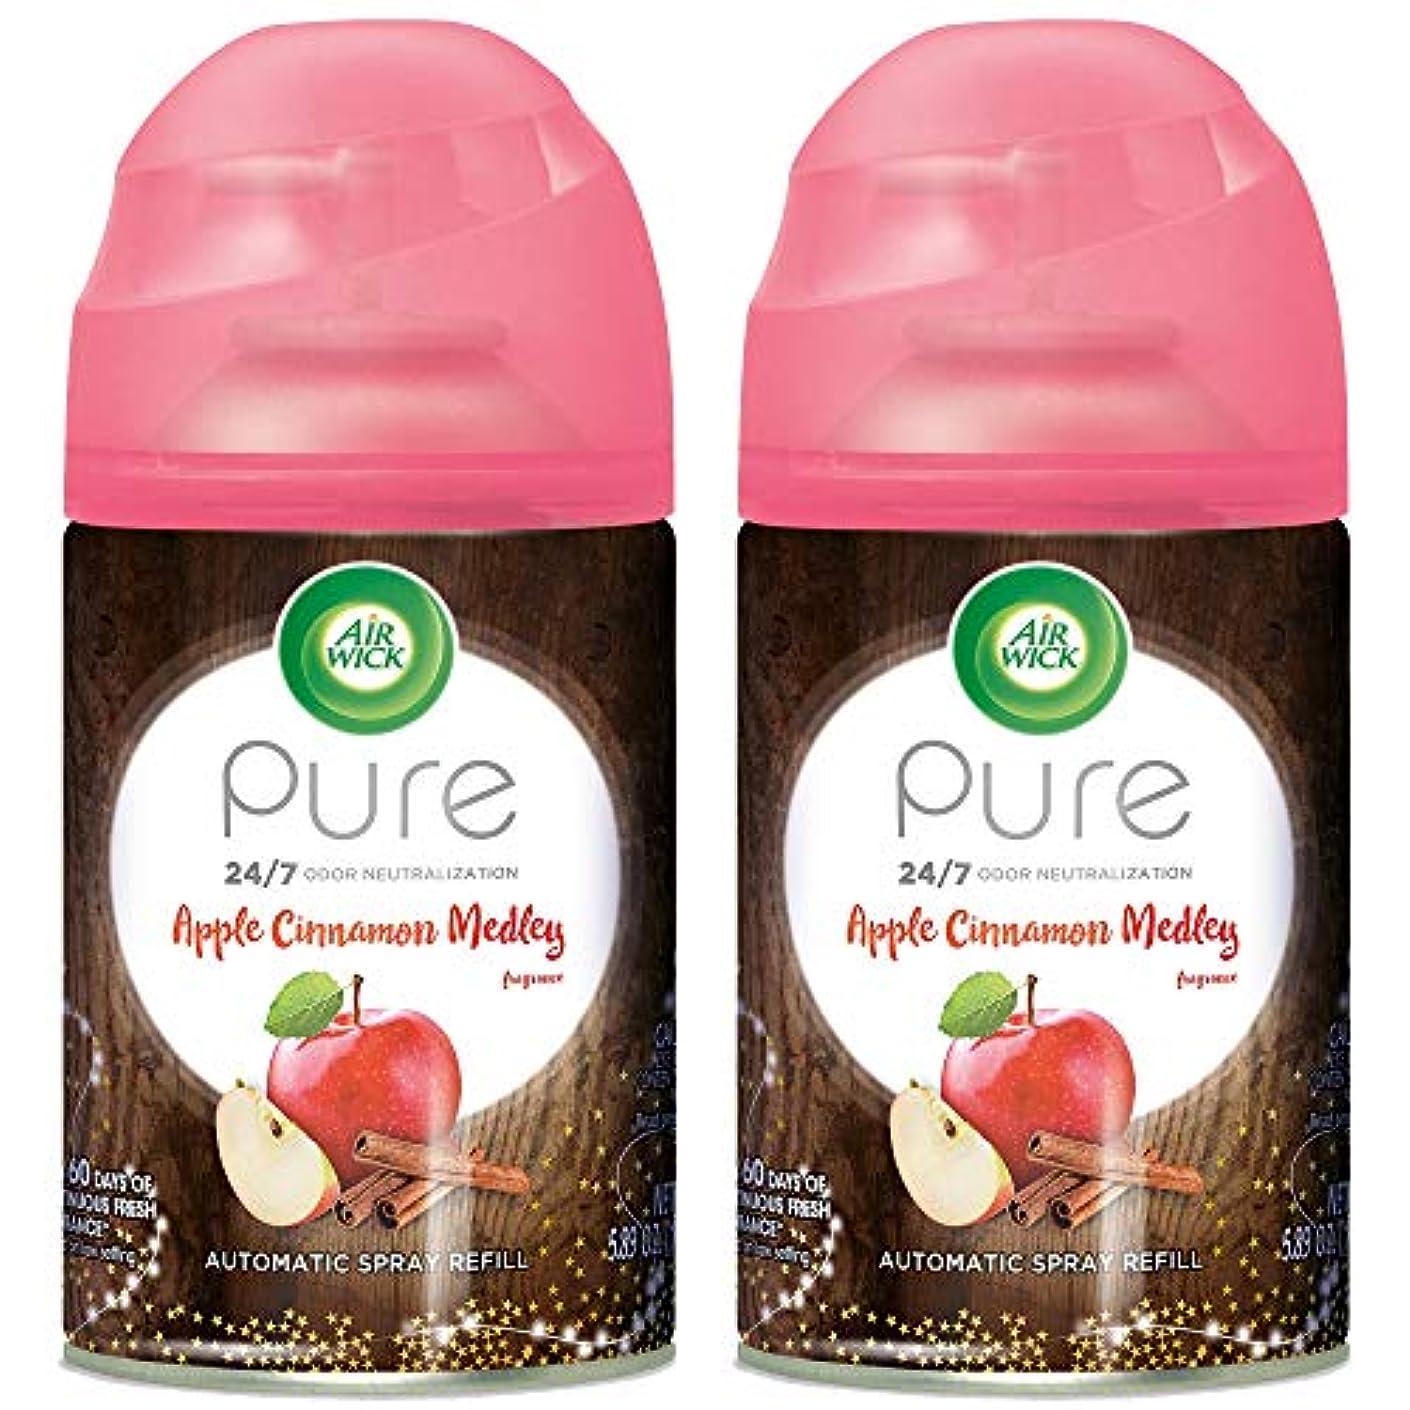 Air Wick Pure Freshmatic 2 Refills Automatic Spray, Apple Cinnamon Medley, (2x5.89oz), Air Freshener, Essential Oil, Odor Neutralization, Packaging May Vary